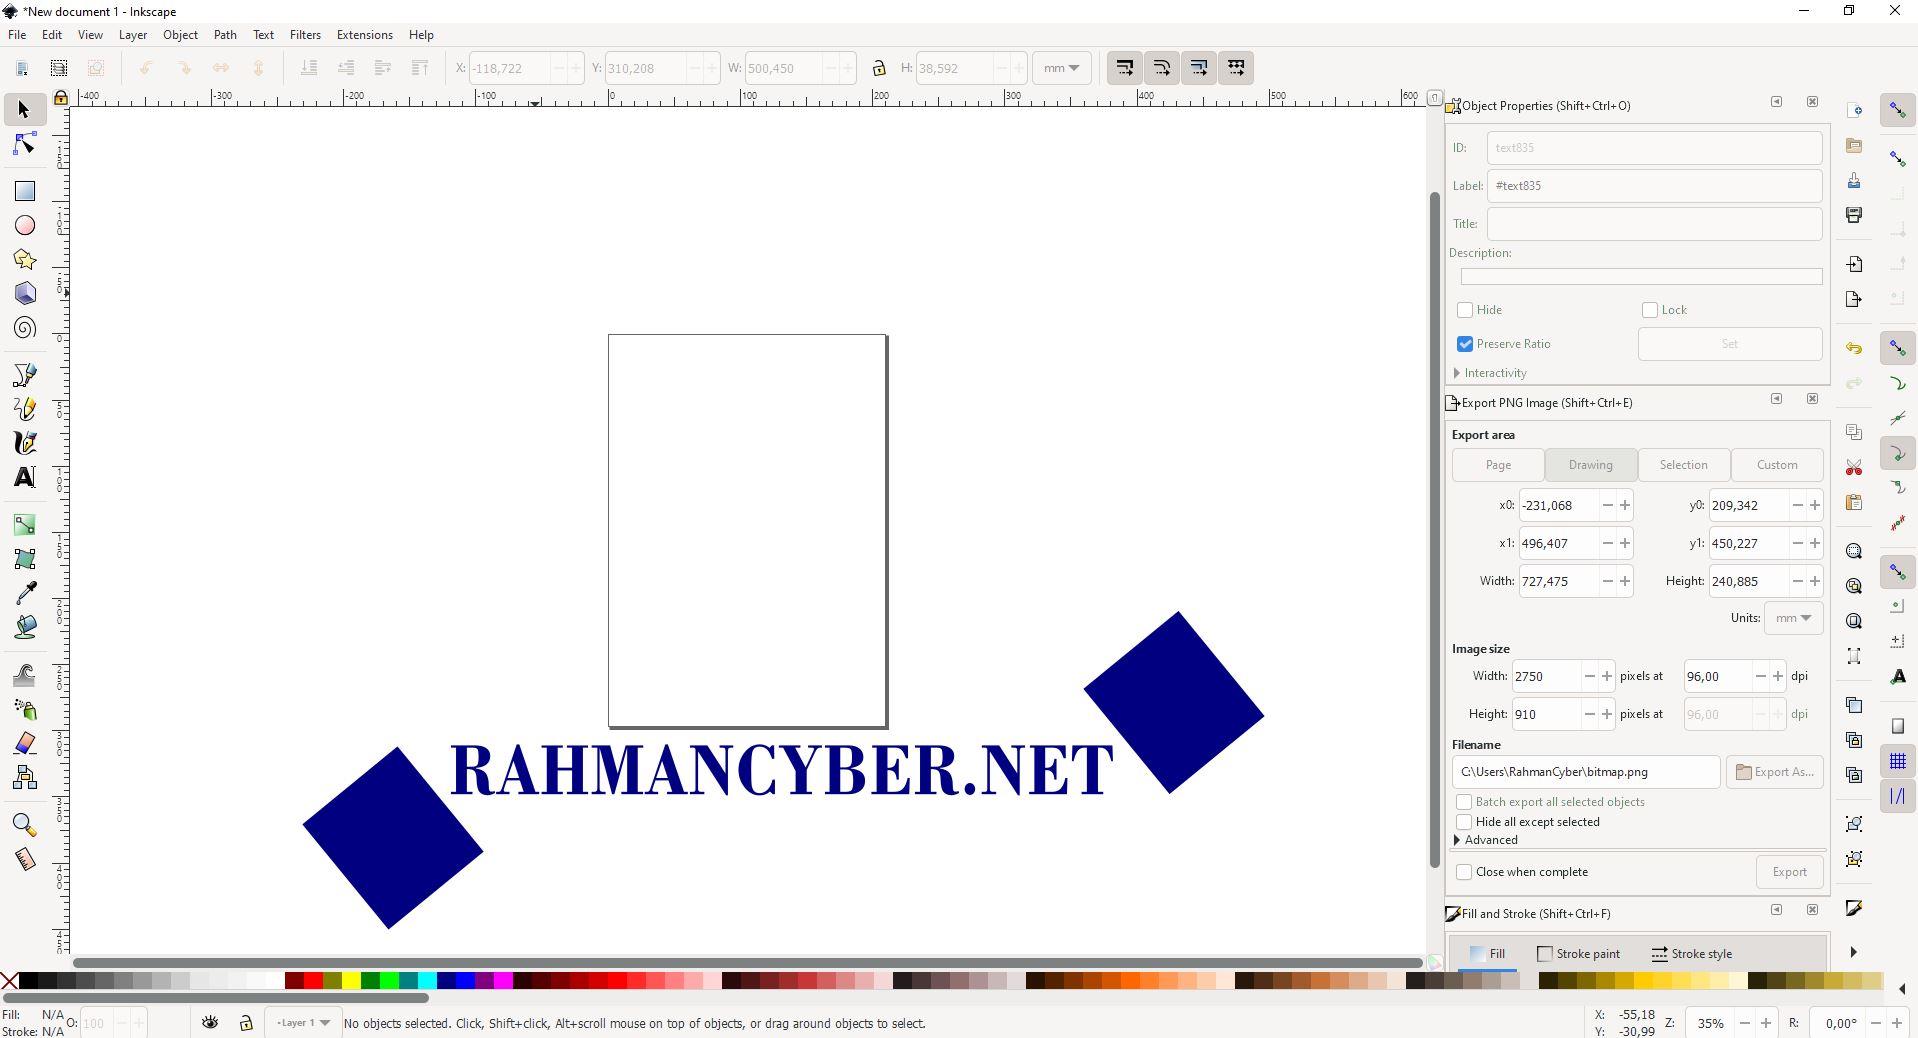 inkscape 1.0.2 tanpa welcome screen